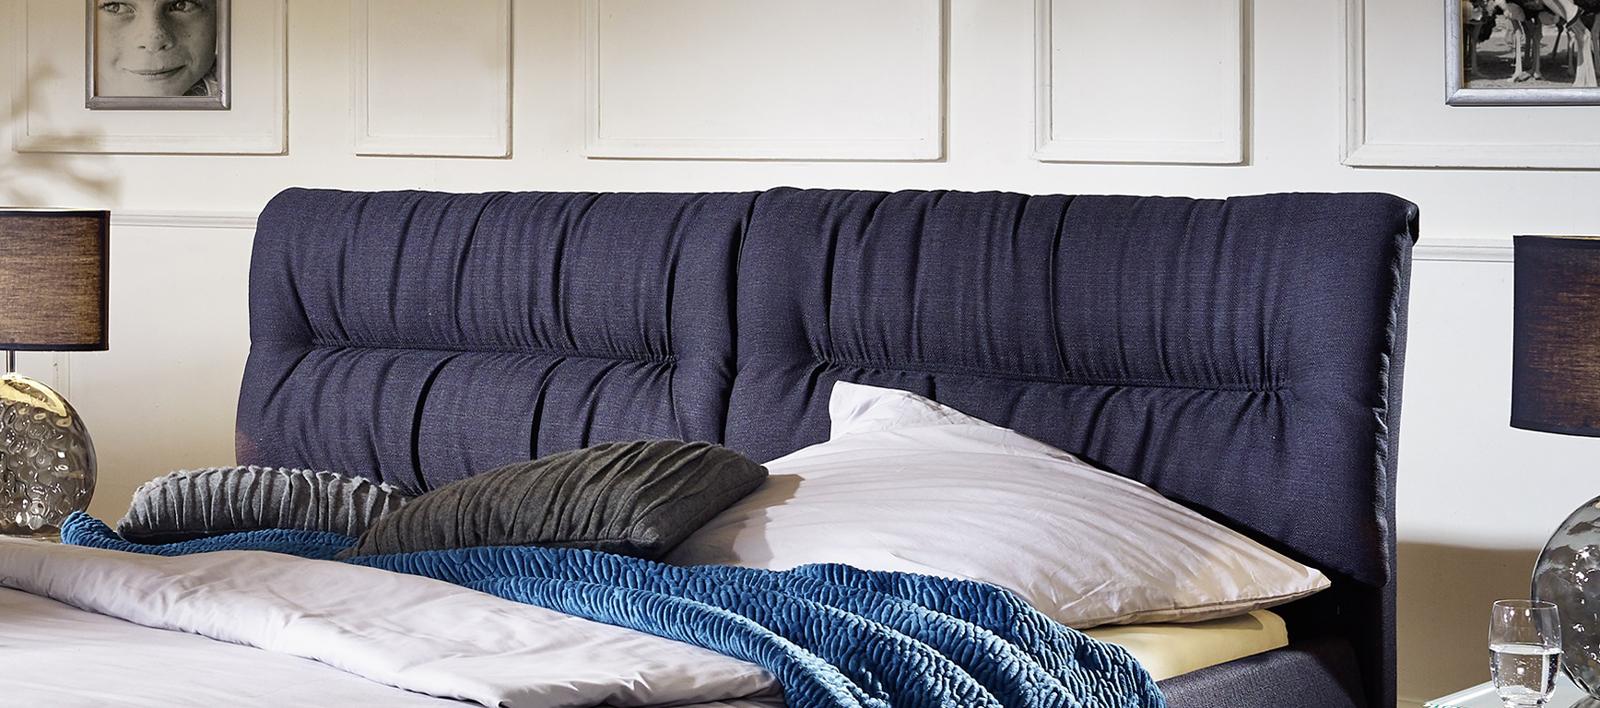 sam design bett 180 x 200 cm anthrazit mia g nstig. Black Bedroom Furniture Sets. Home Design Ideas